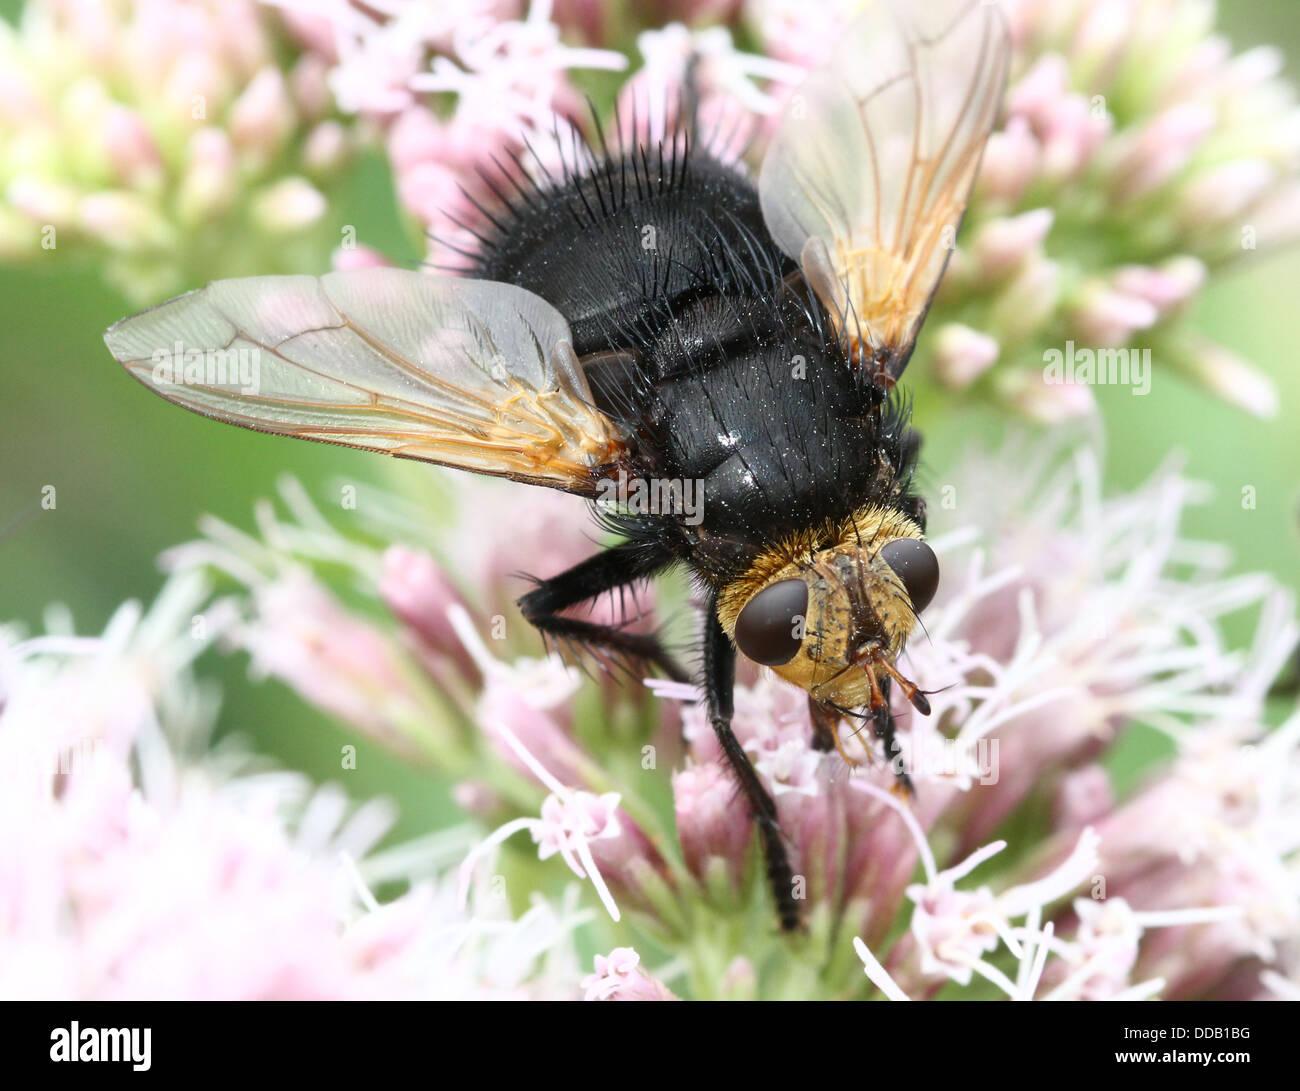 Giant tachinid fly (Tachina grossa) feeding on a hemp-agrimony flower Stock Photo